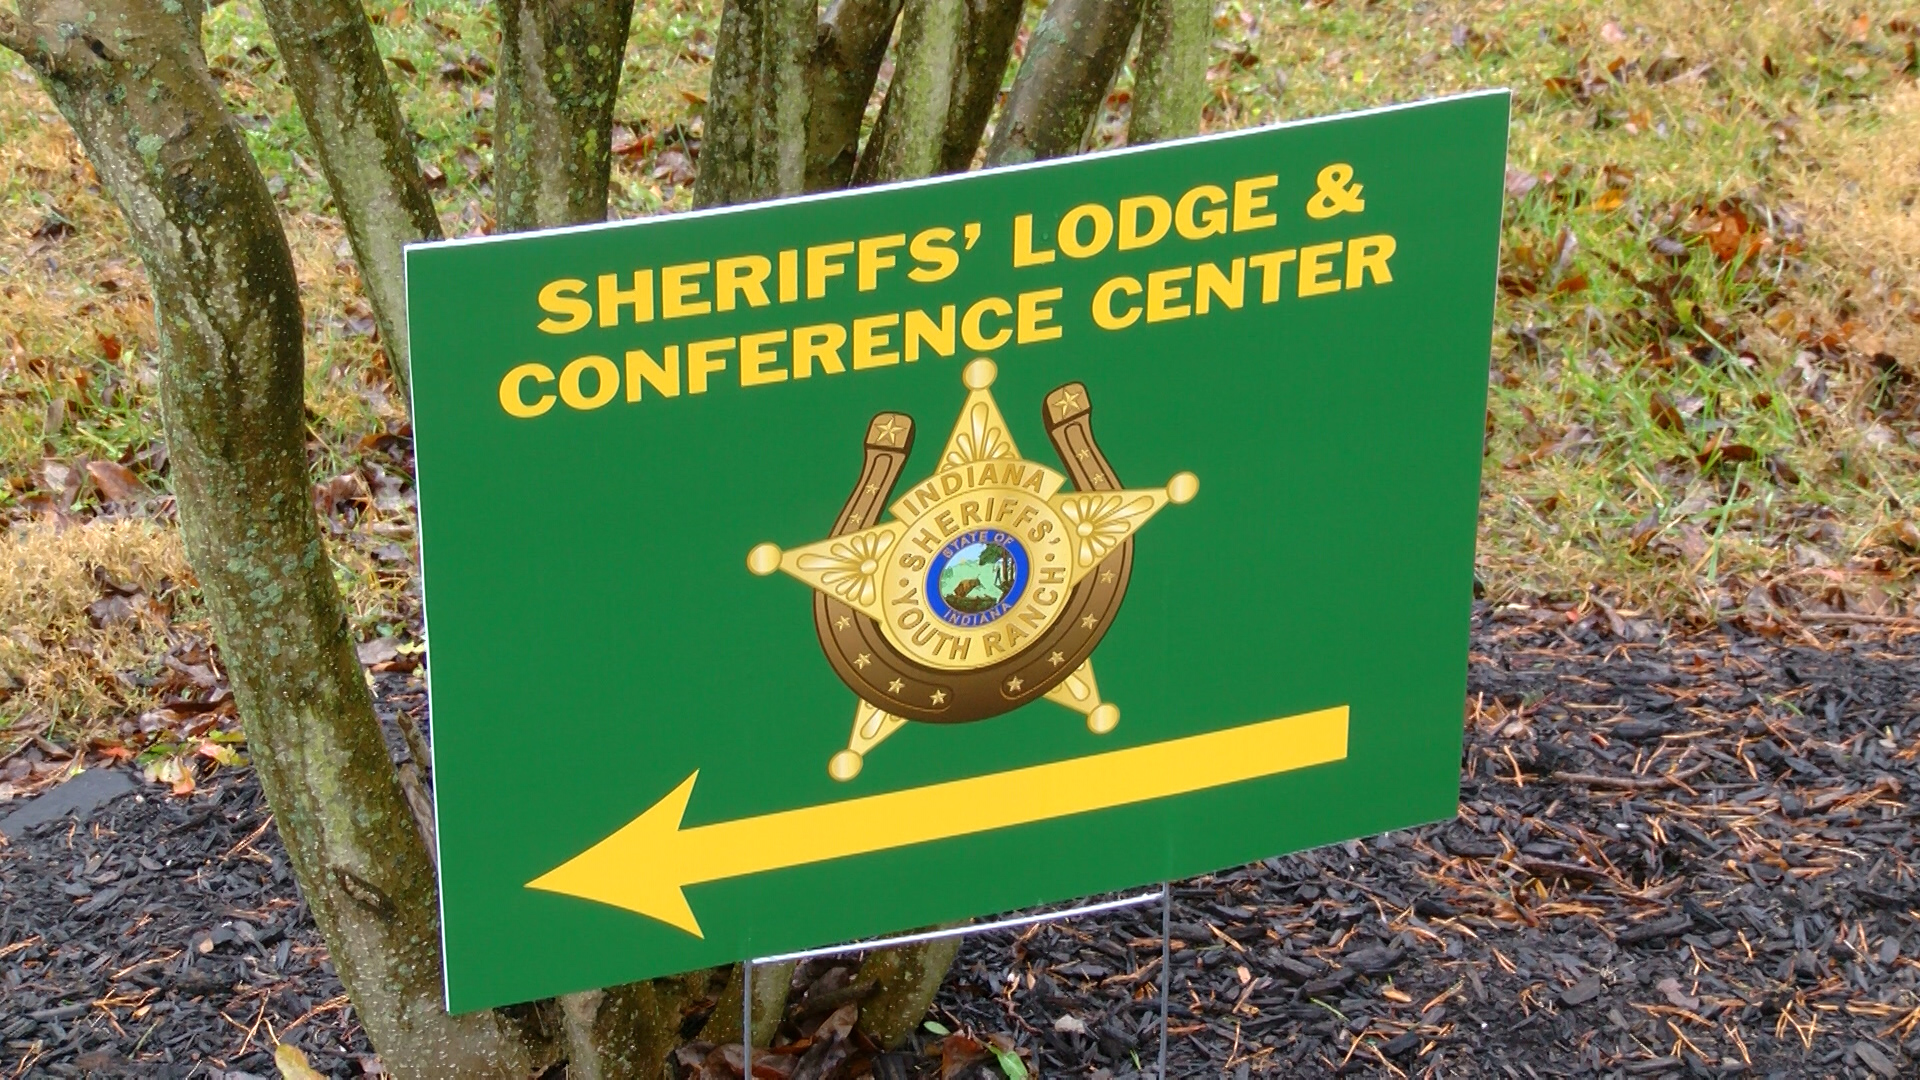 Sheriff Lodge_1513981437132.jpg.jpg